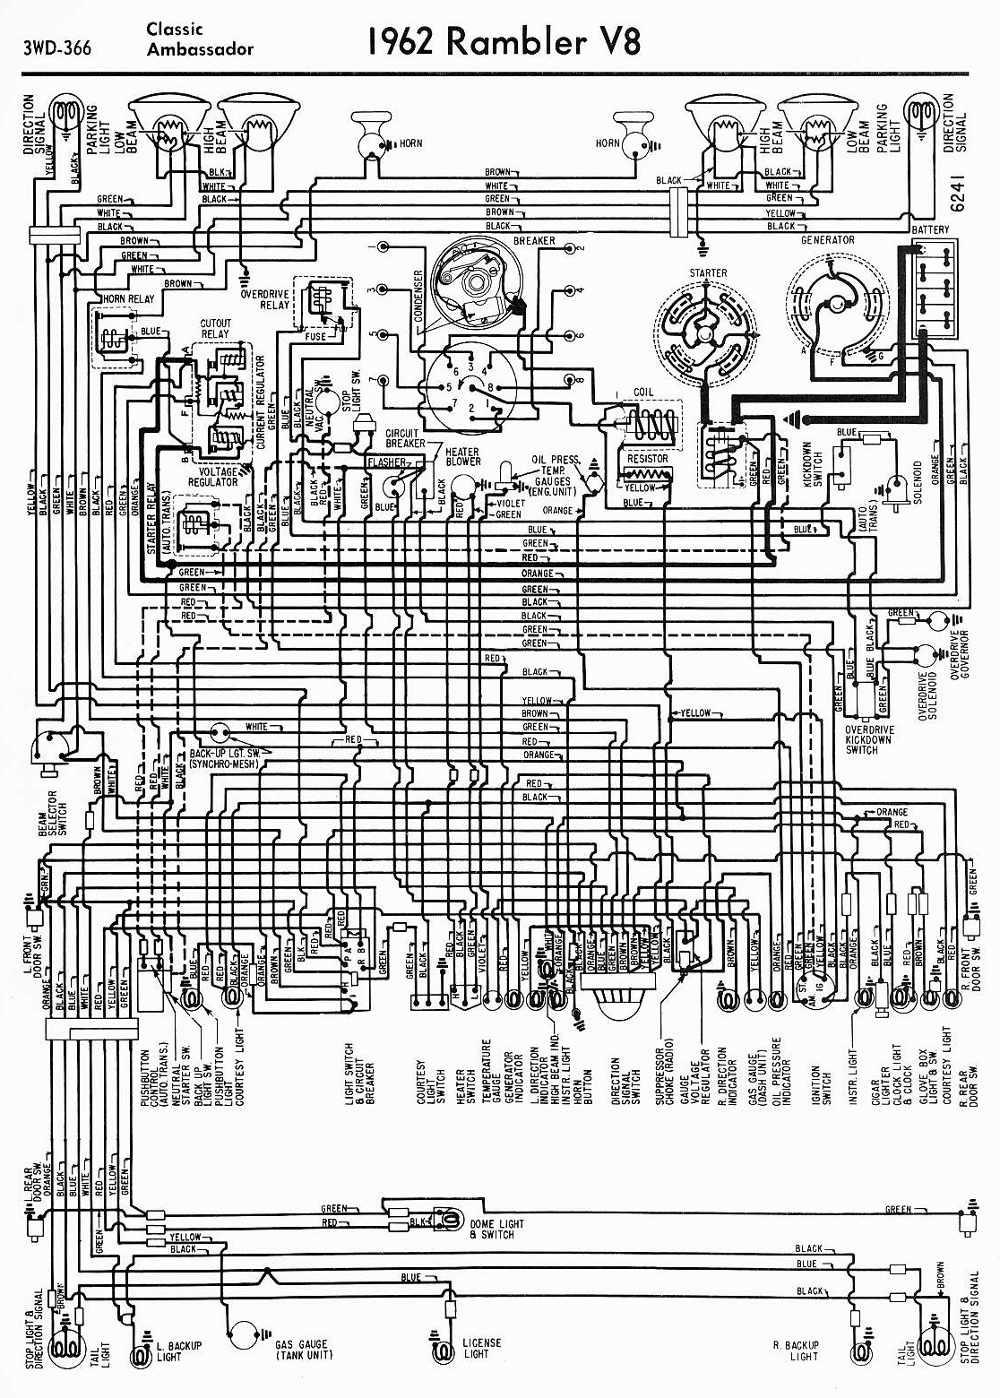 1962 Bonneville Wiring Diagram Electrical Diagrams Tr3 Pontiac Trusted U2022 1969